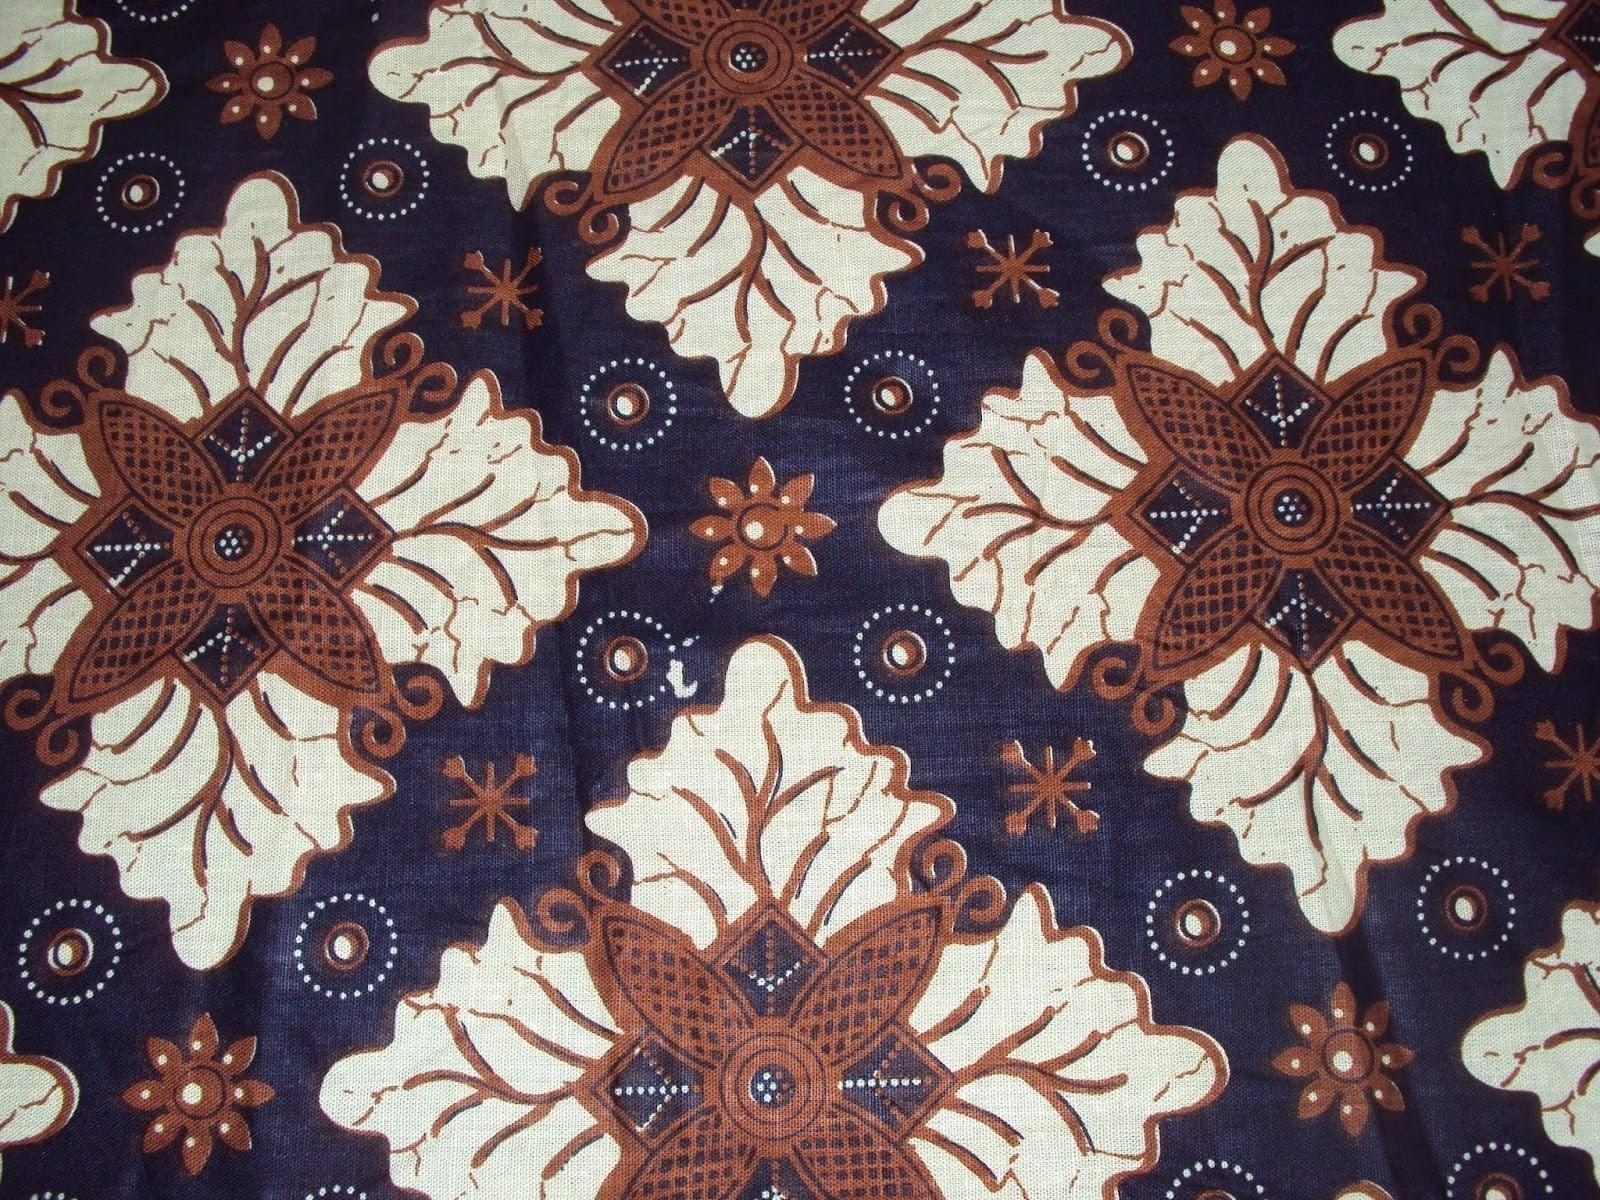 Batik Pekalongan Motif Classic Floral